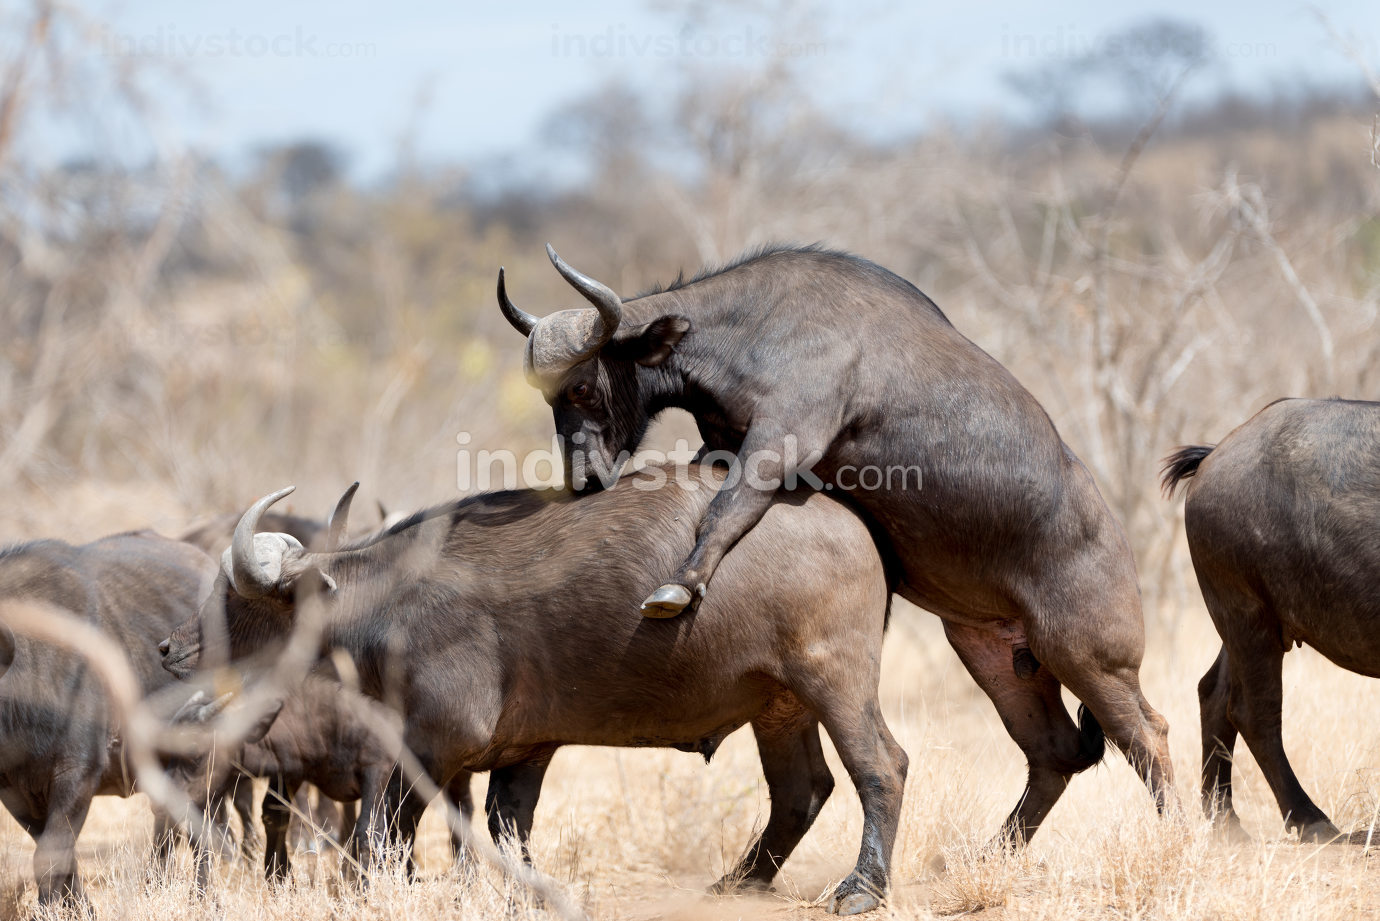 Cape buffalo mating portrait